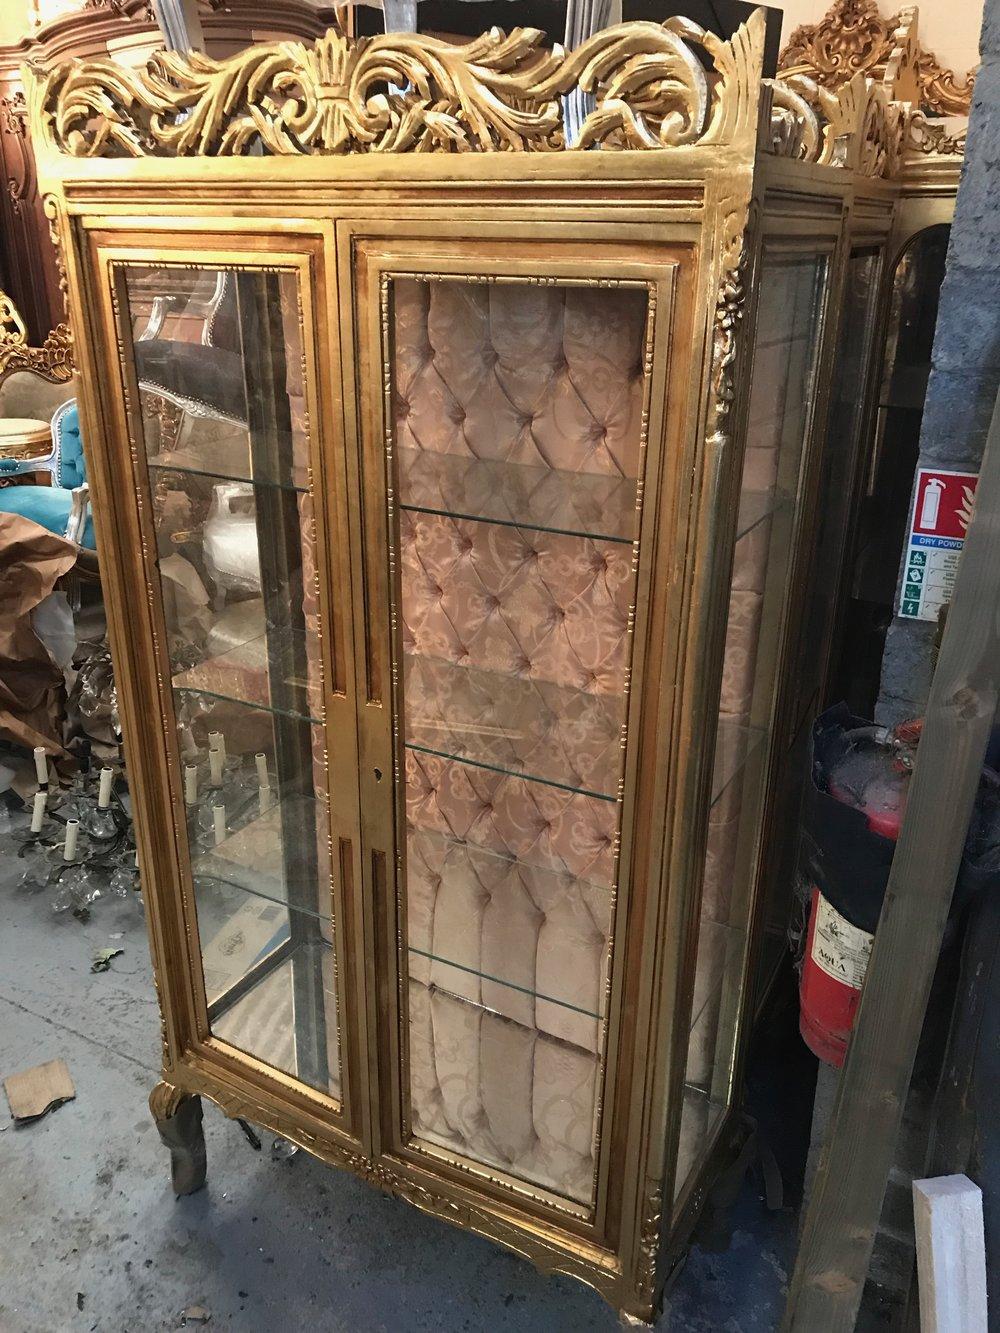 Renaissance Antique Furniture and Lighting Warehouse Dublin Ireland